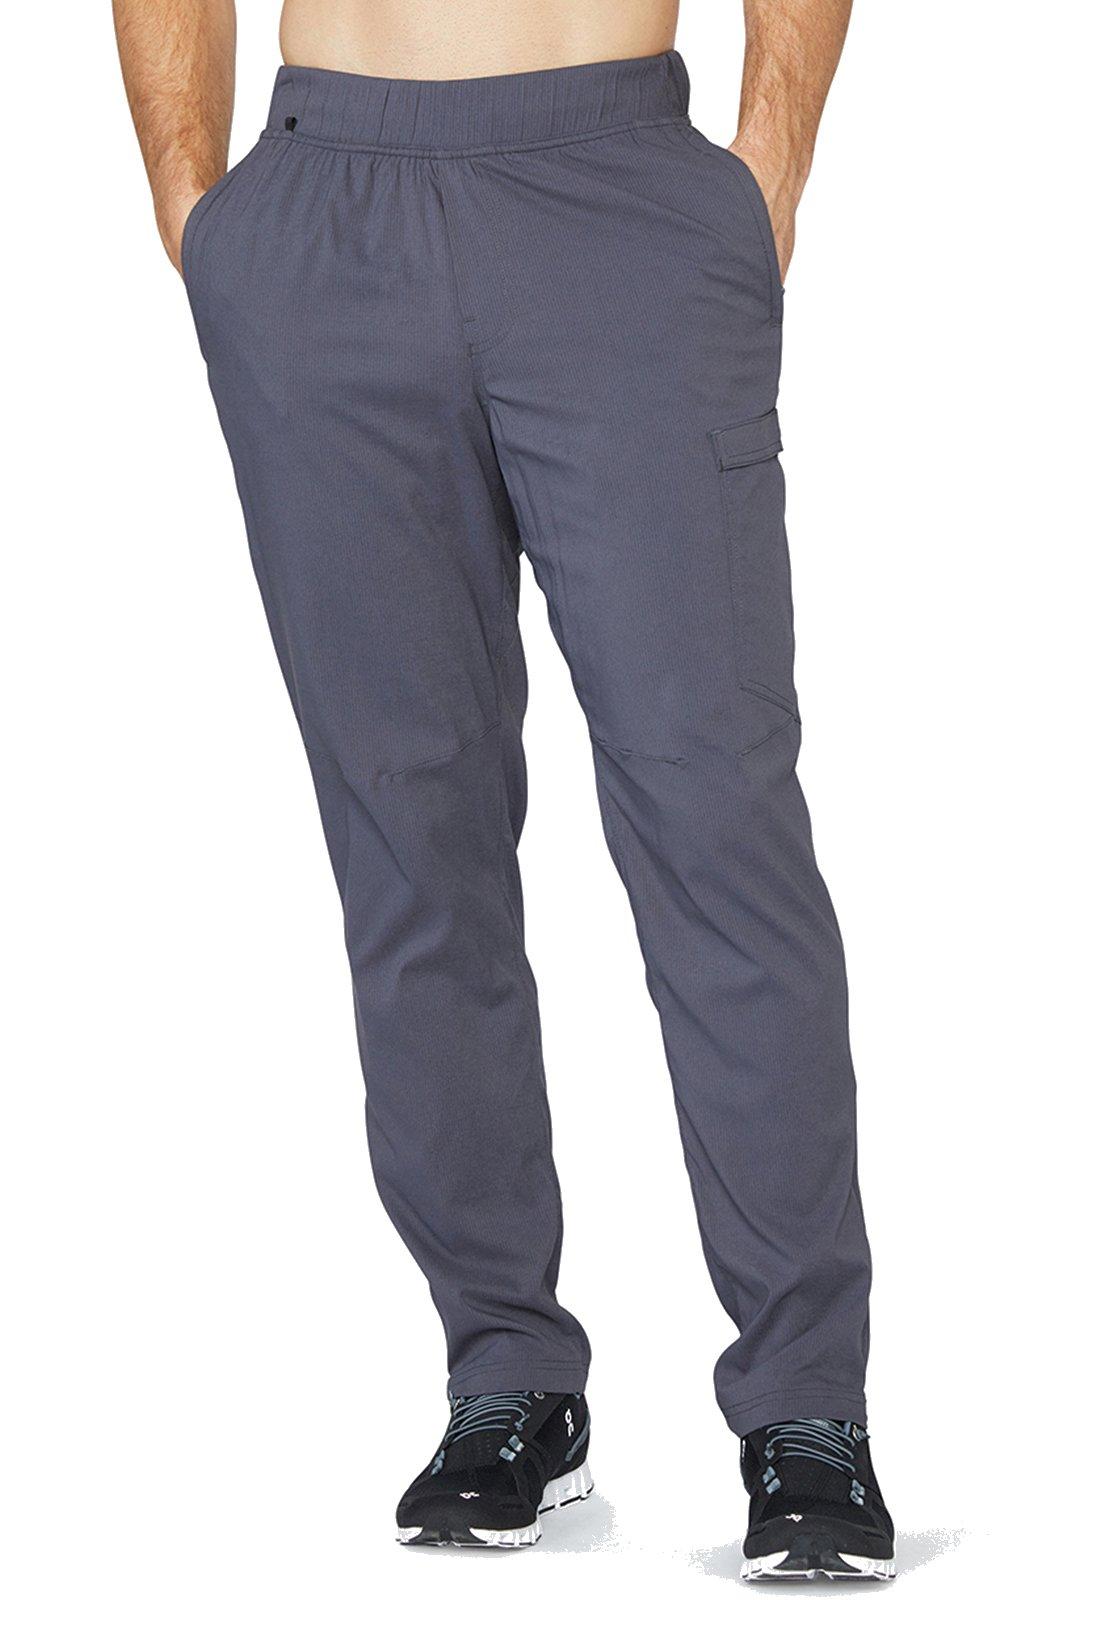 SOLFIRE Men's Nomad Pant (S, Pewter)